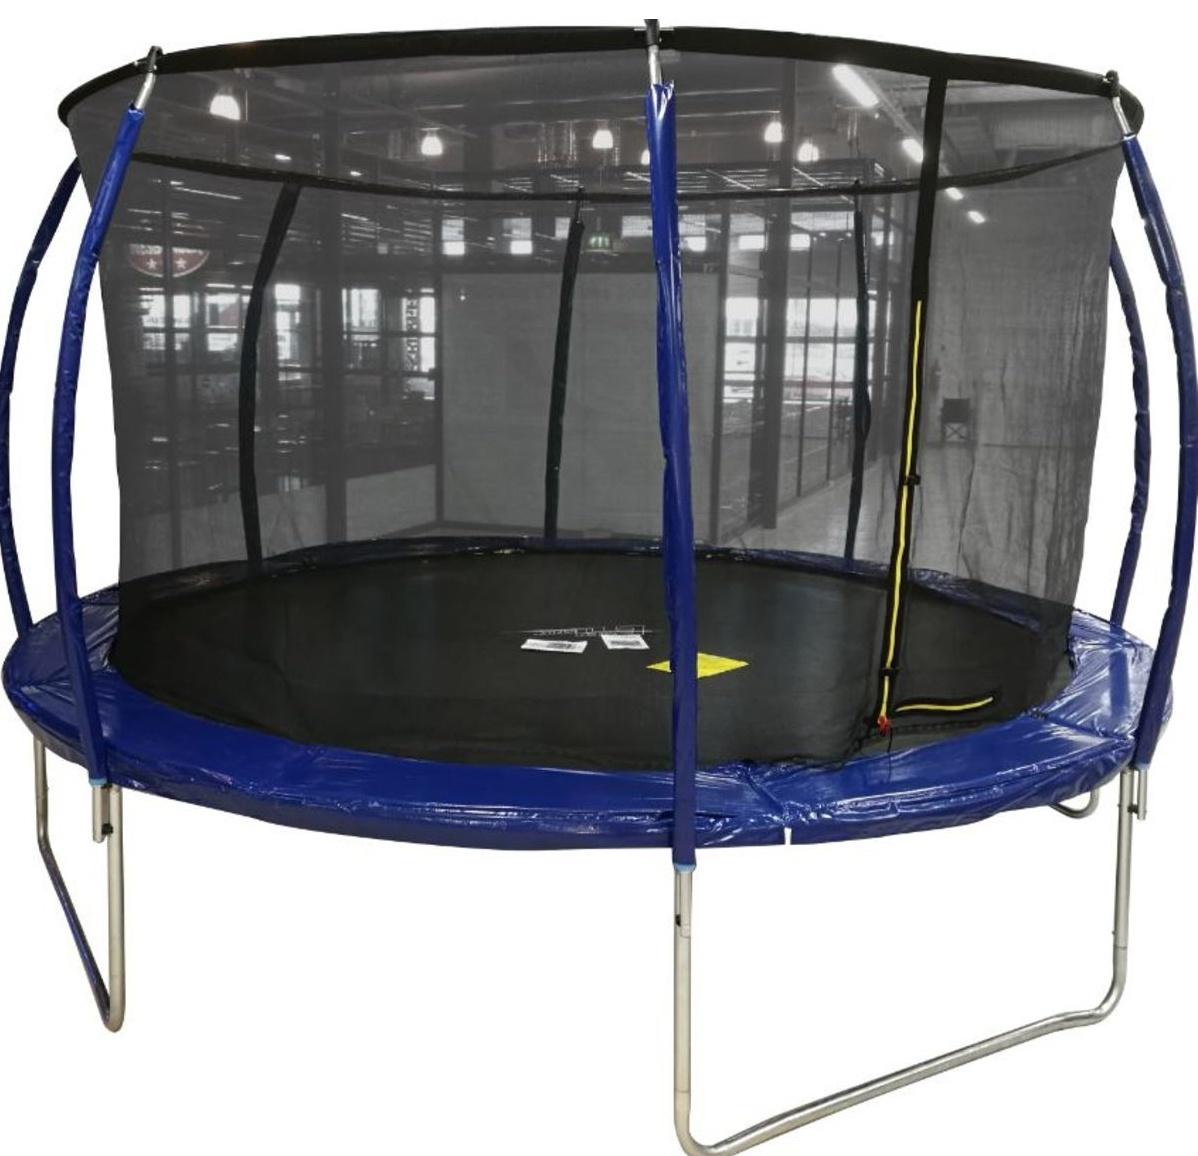 trampoliini_turvaverkolla_396m_enermix